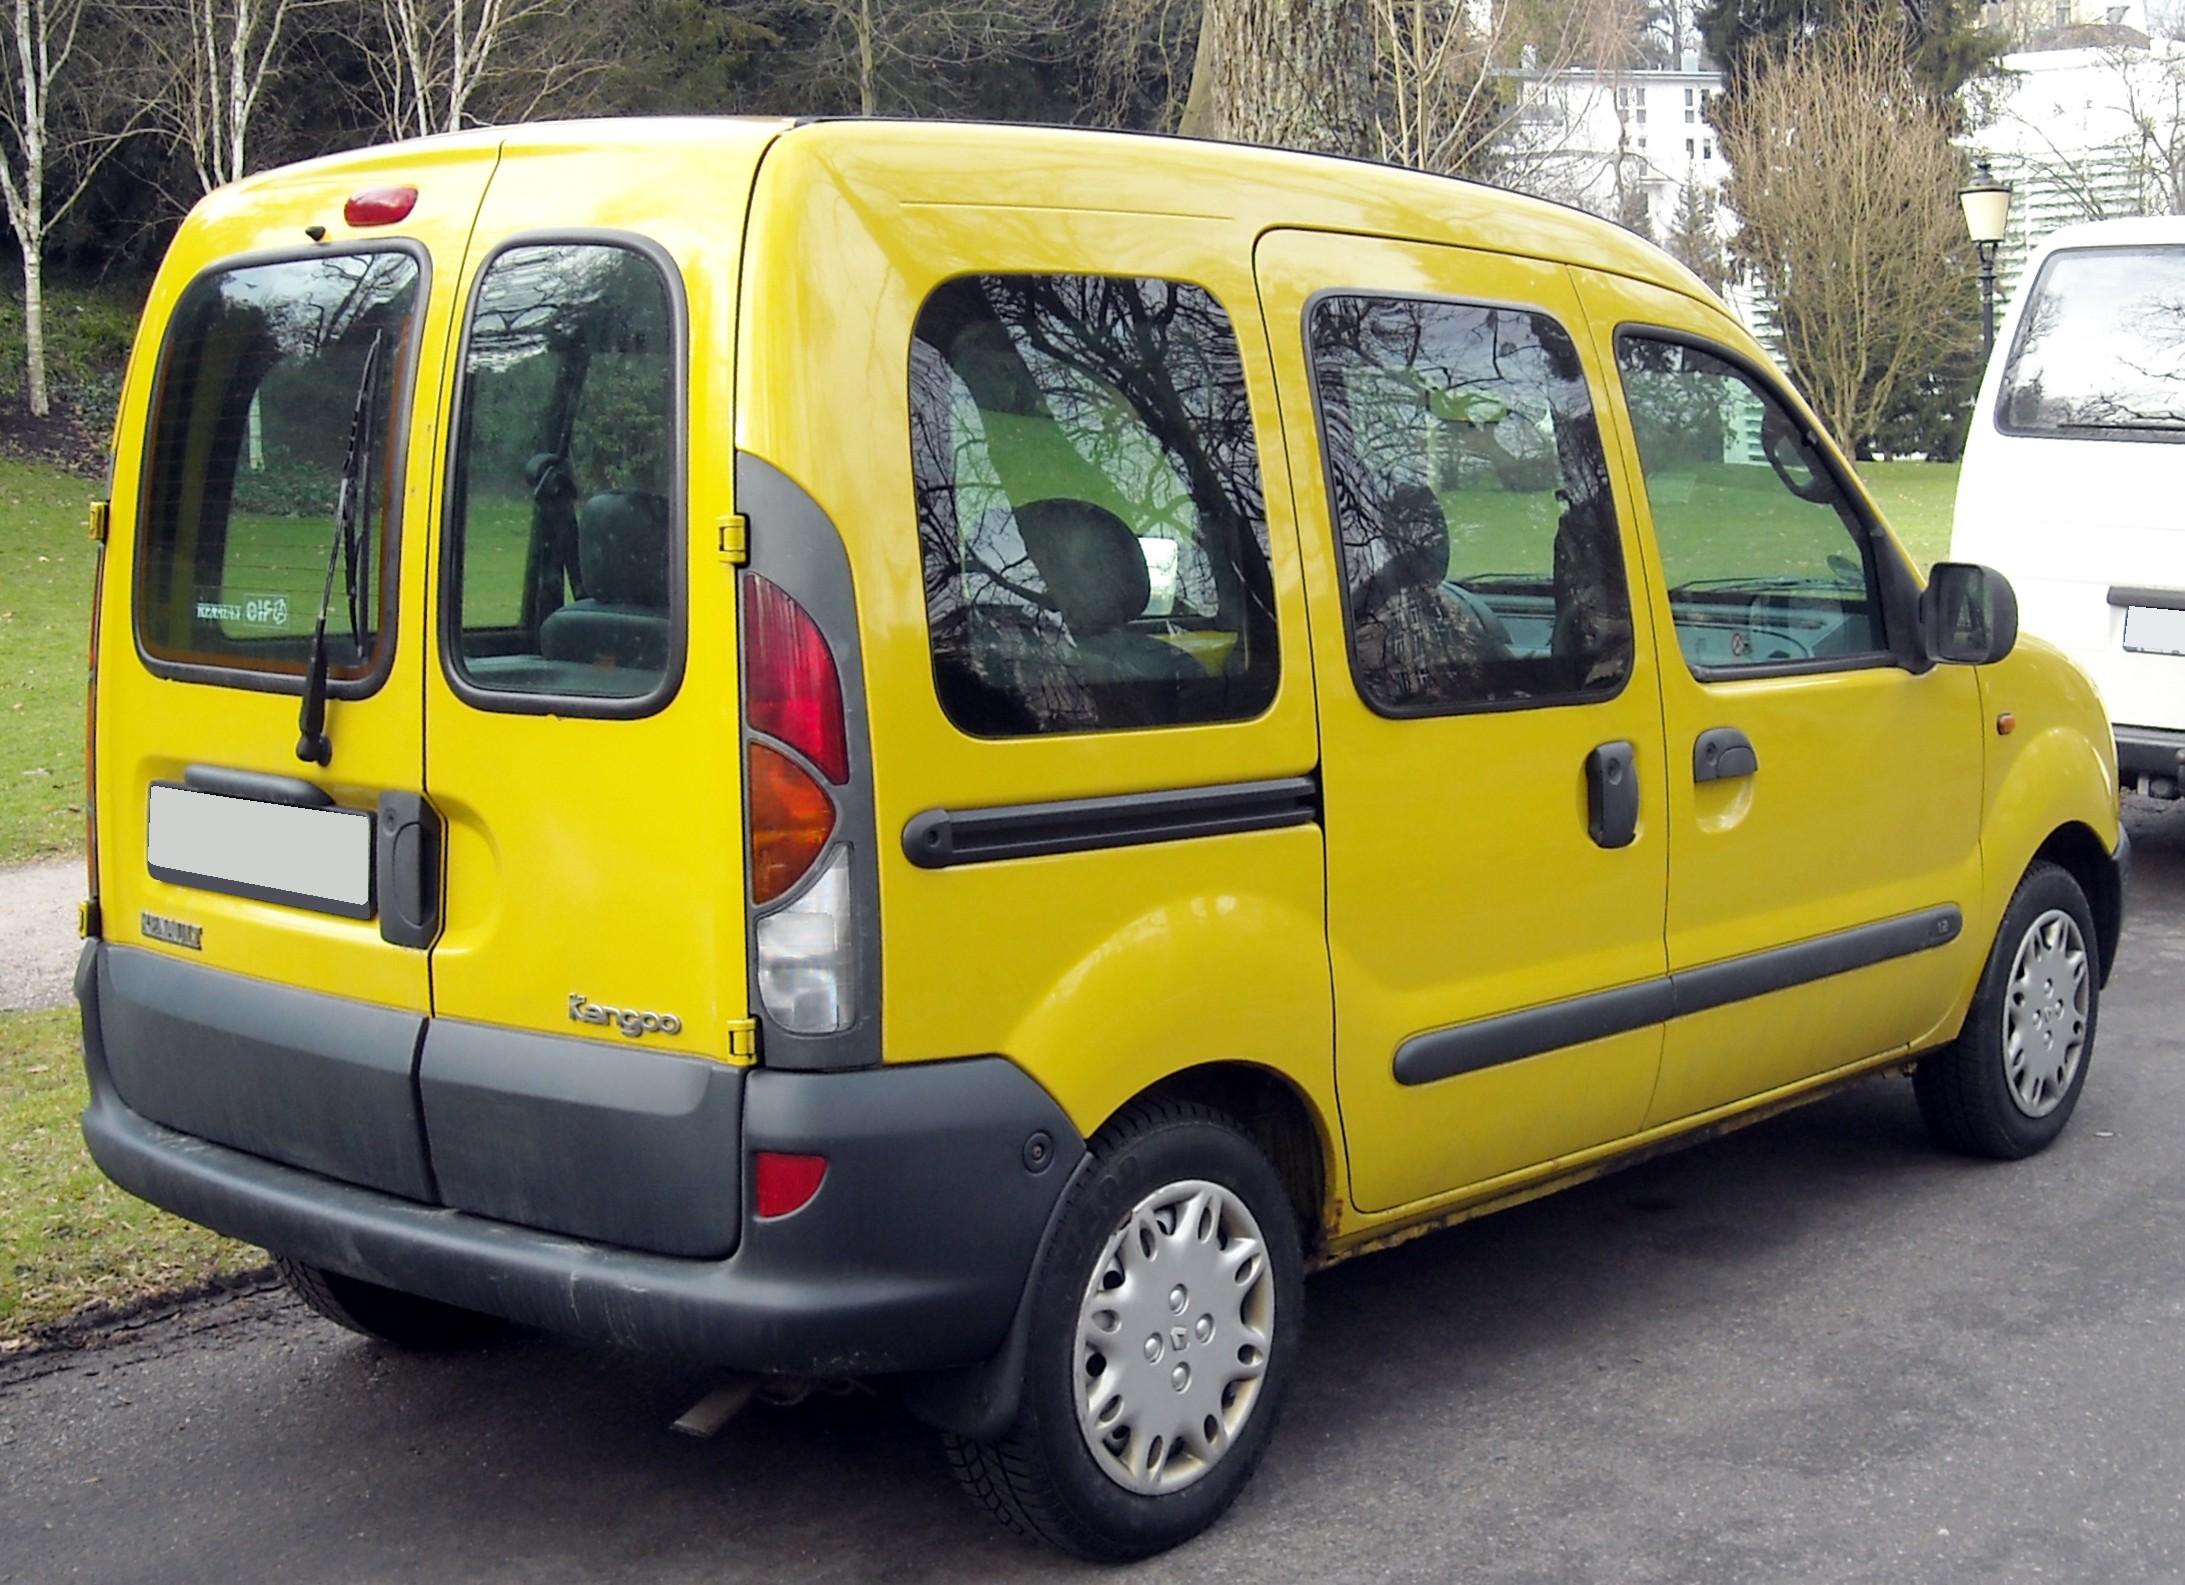 Renault_Kangoo_I_rear_20090121.jpg